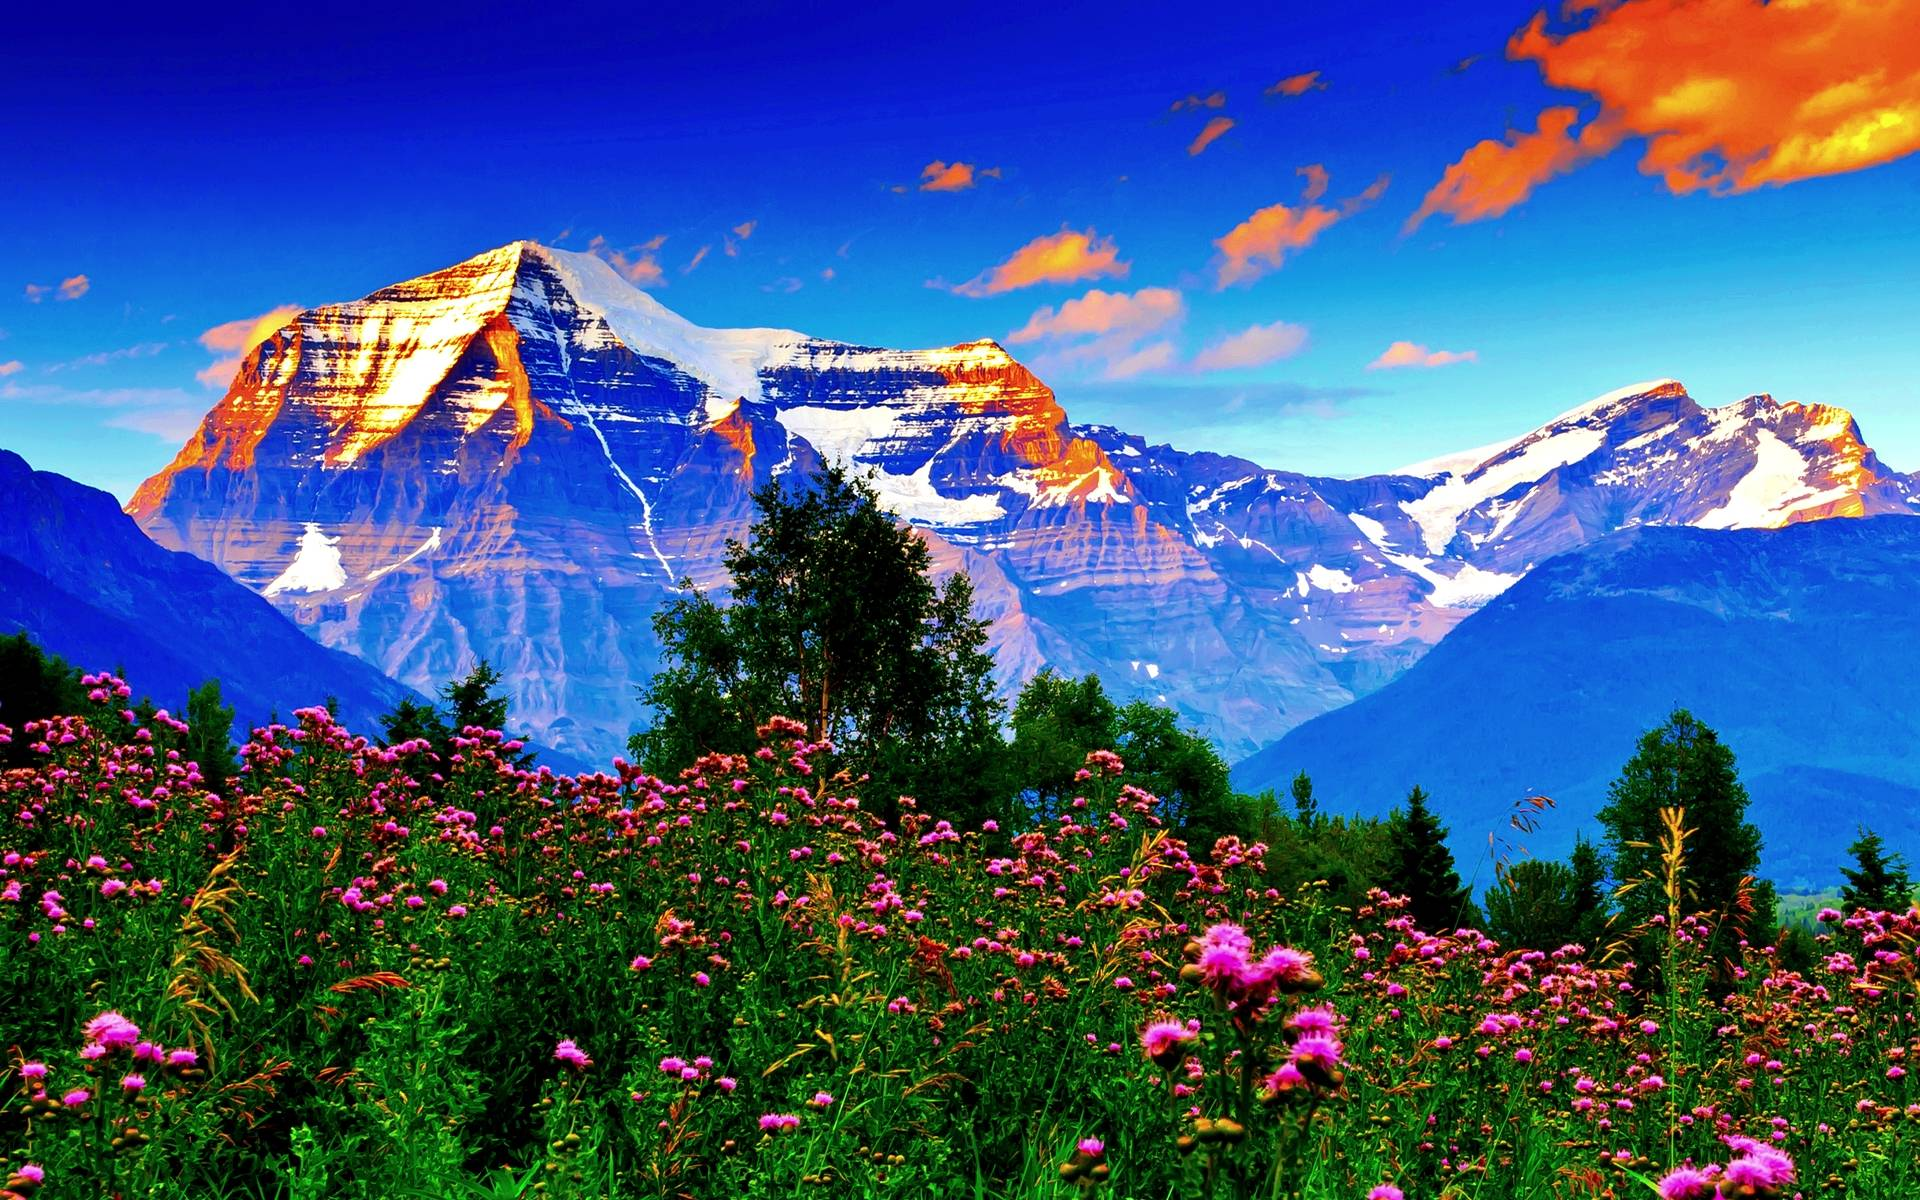 Great Wallpaper Mountain Spring - tK7vQw1  Graphic_491371.jpg